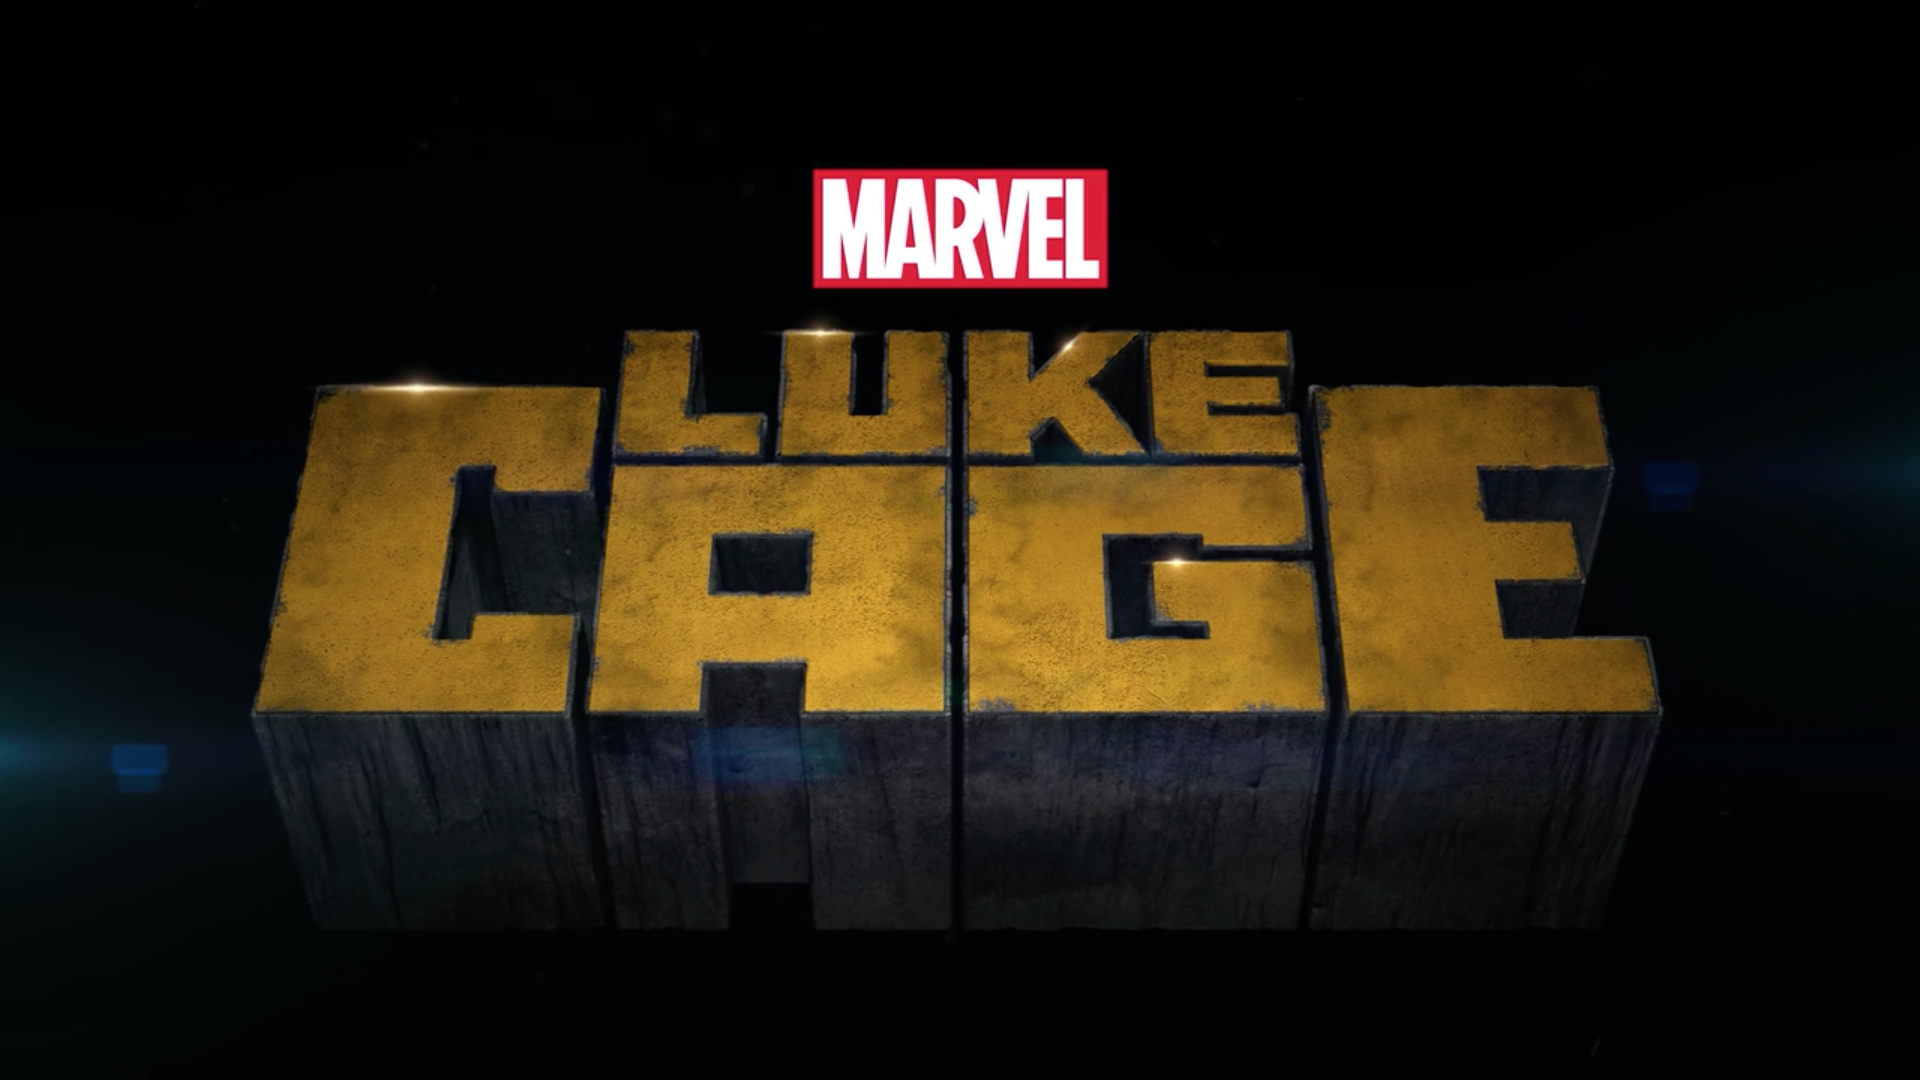 Luke Cage Teaser: Get a Peek at Netflix's Next Marvel Drama.